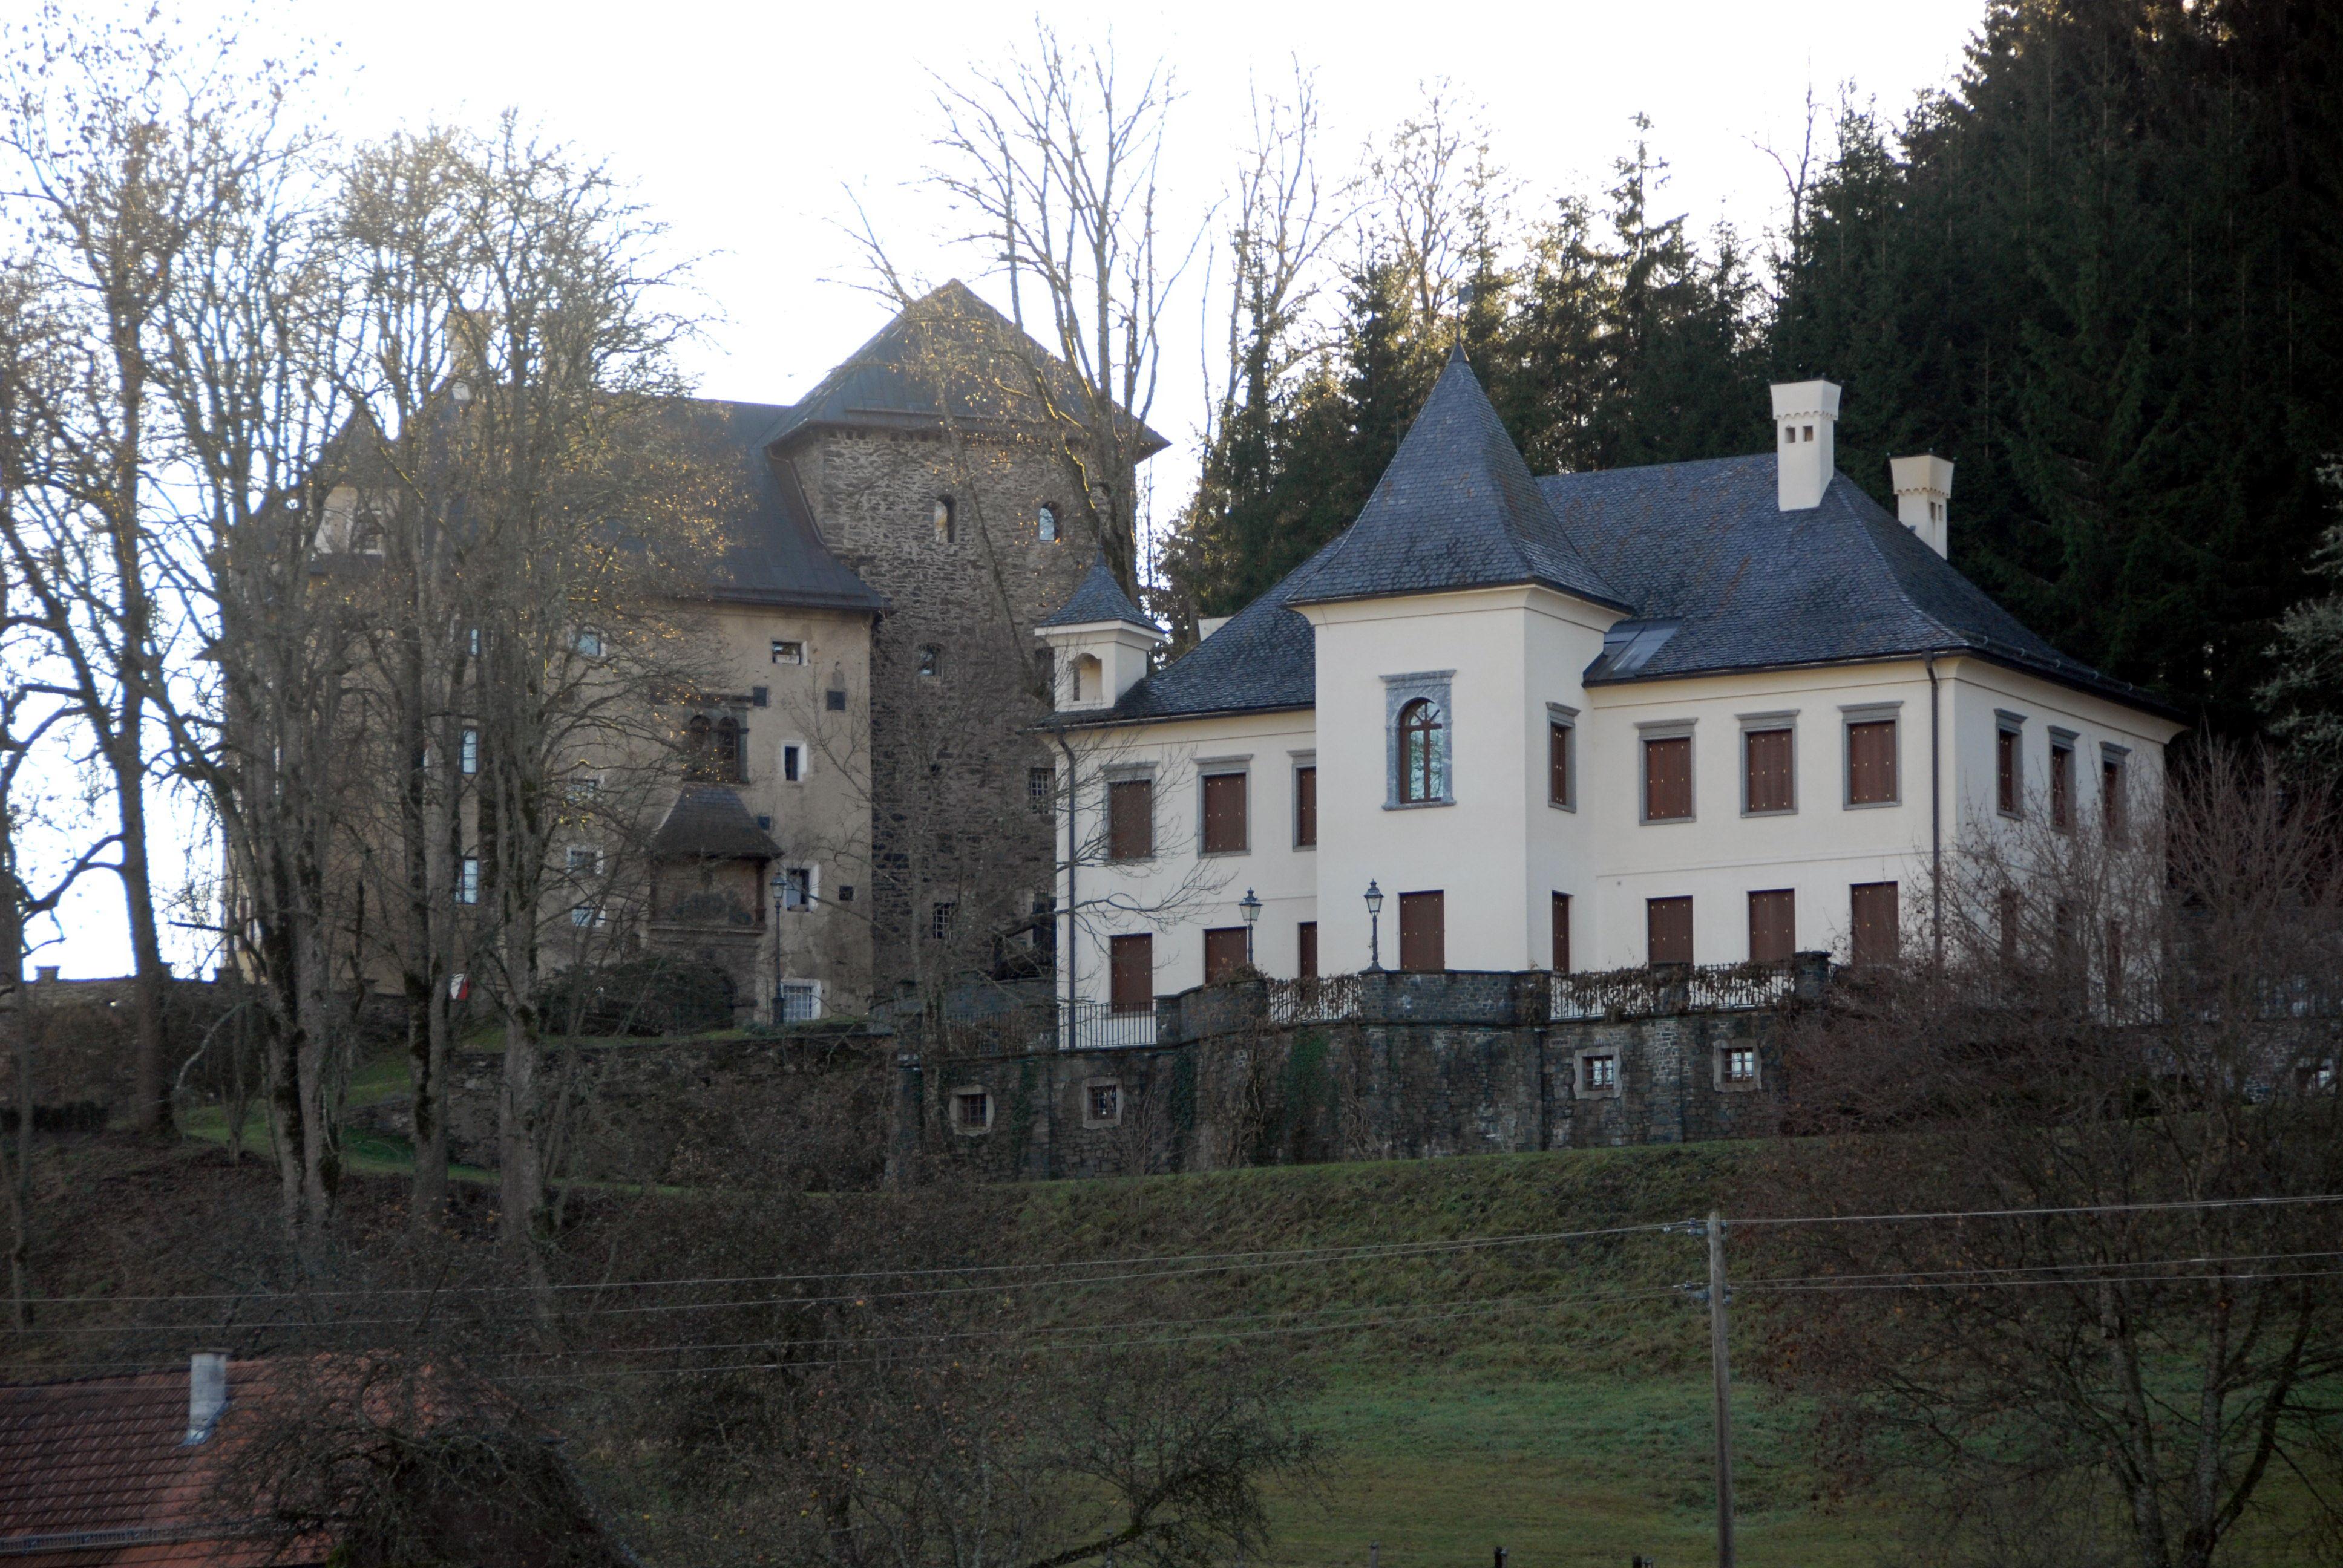 Gainfarn dating den - Weitensfeld im gurktal mann